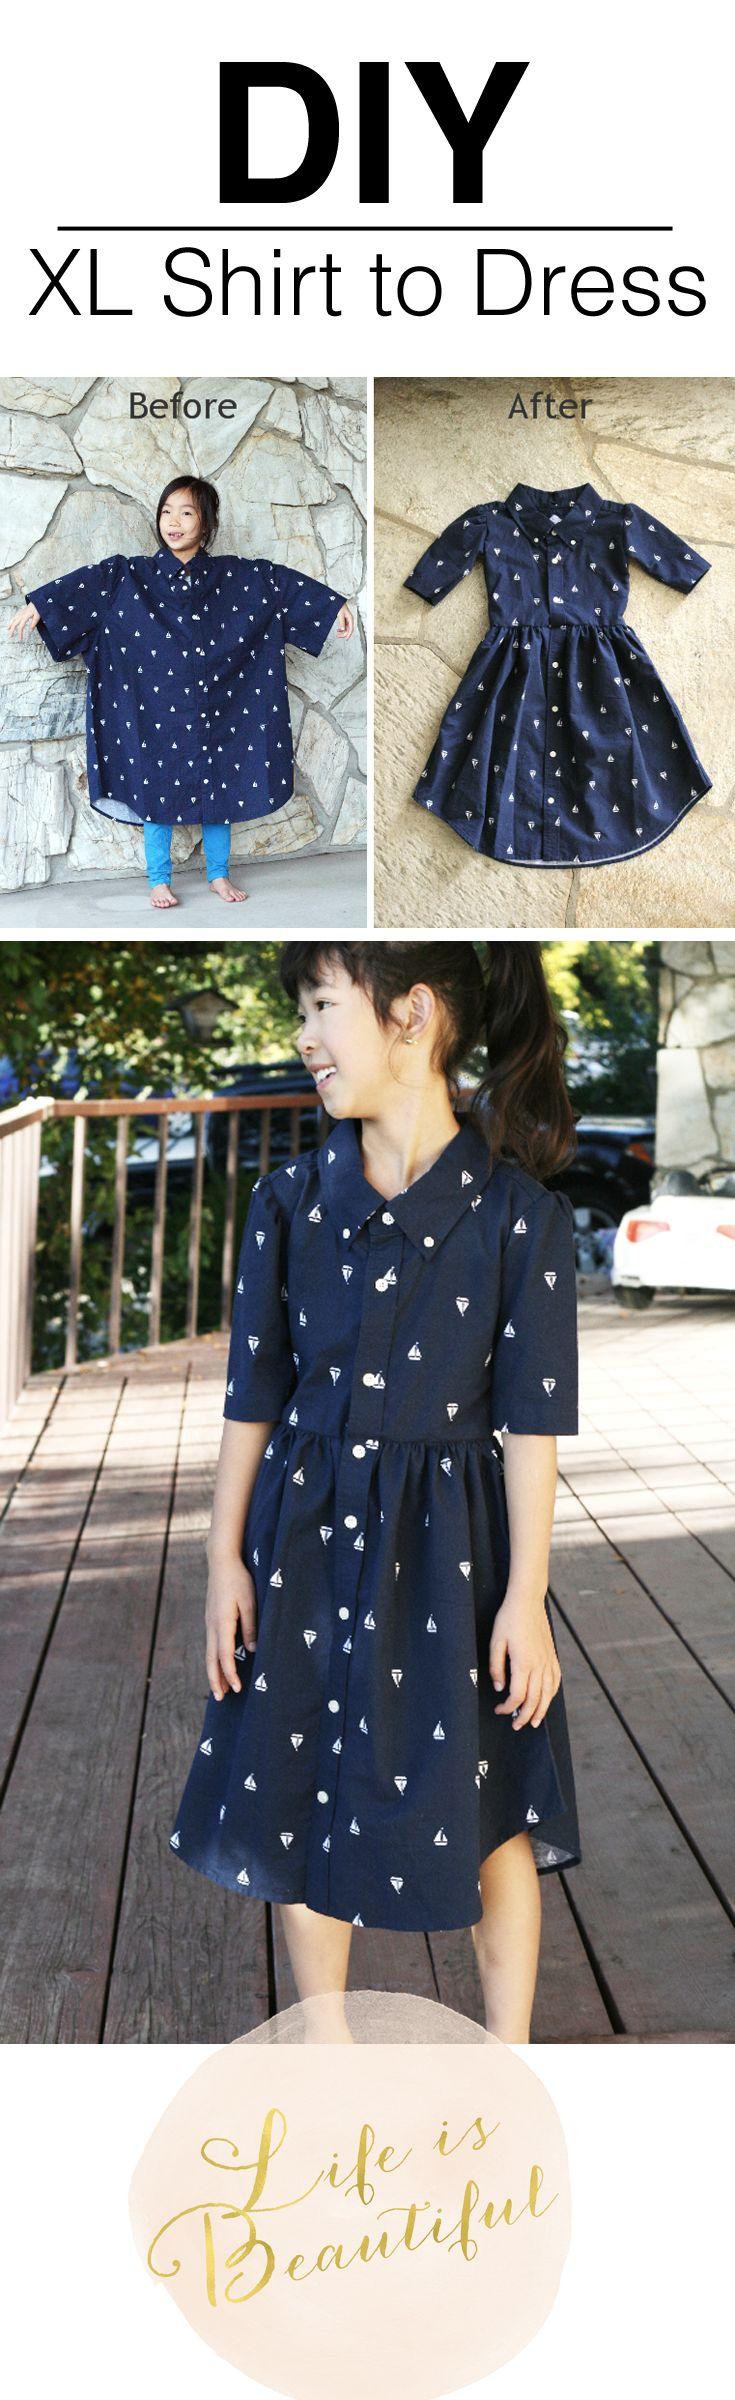 XL men's shirt to little girls dress refashion.